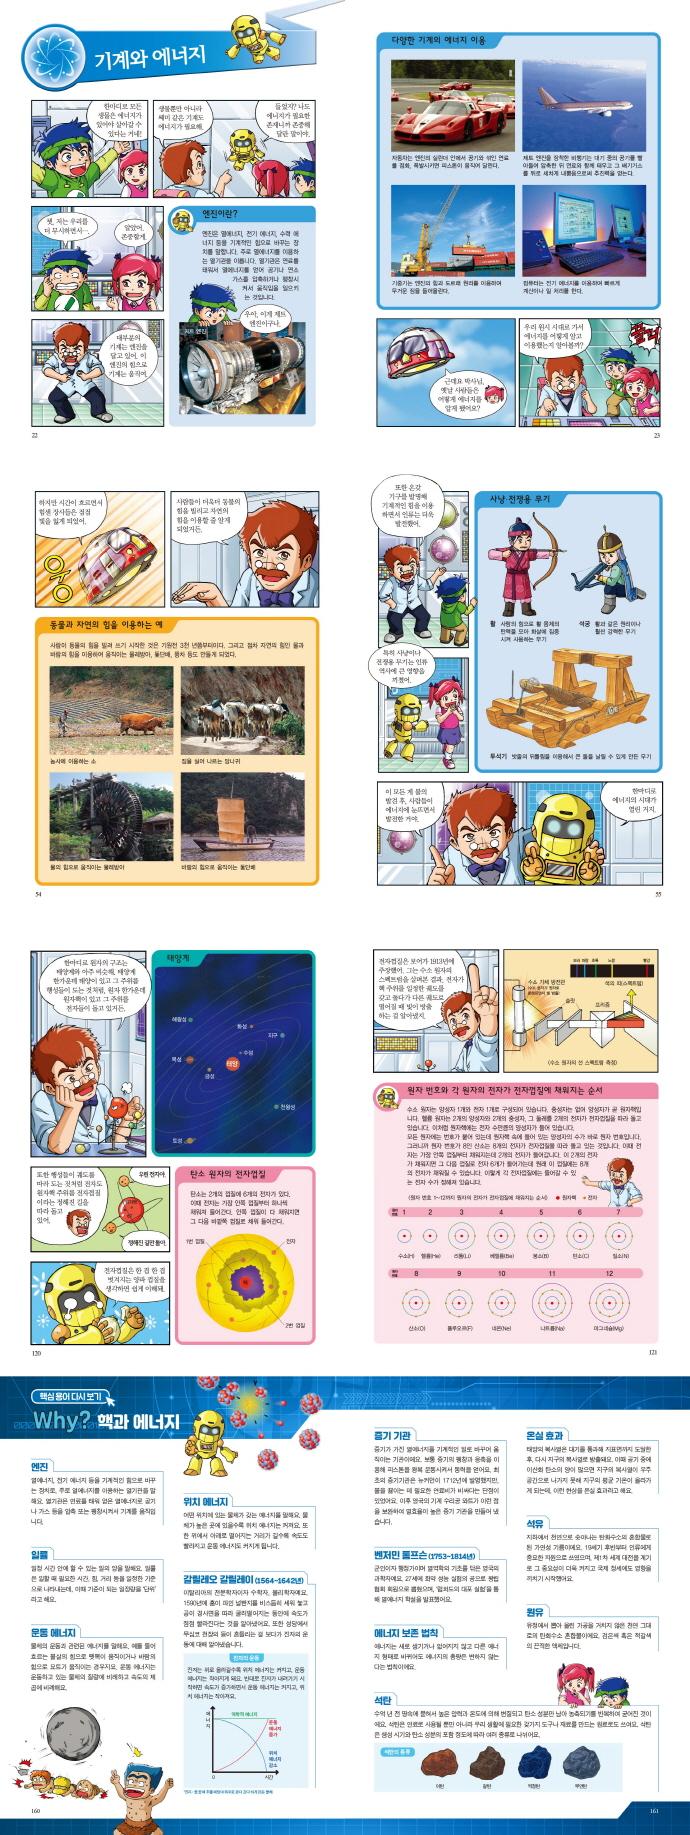 Why? 핵과 에너지(초등과학학습만화 12)(양장본 HardCover) 도서 상세이미지